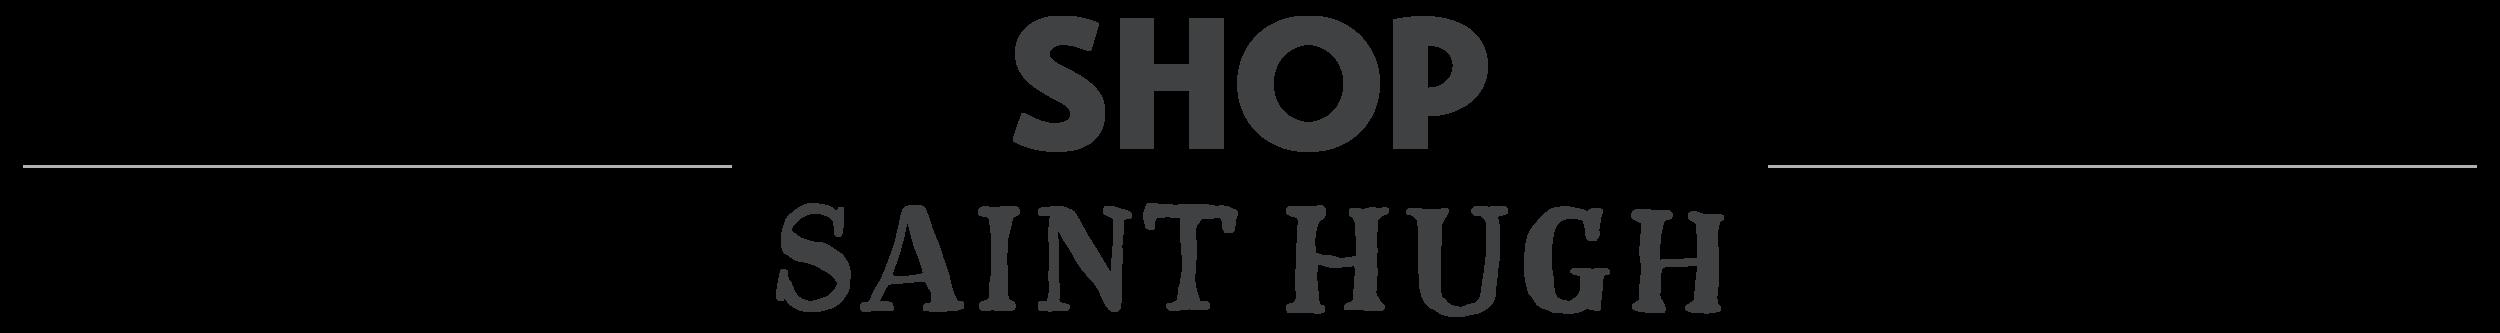 Shop Saint Hugh